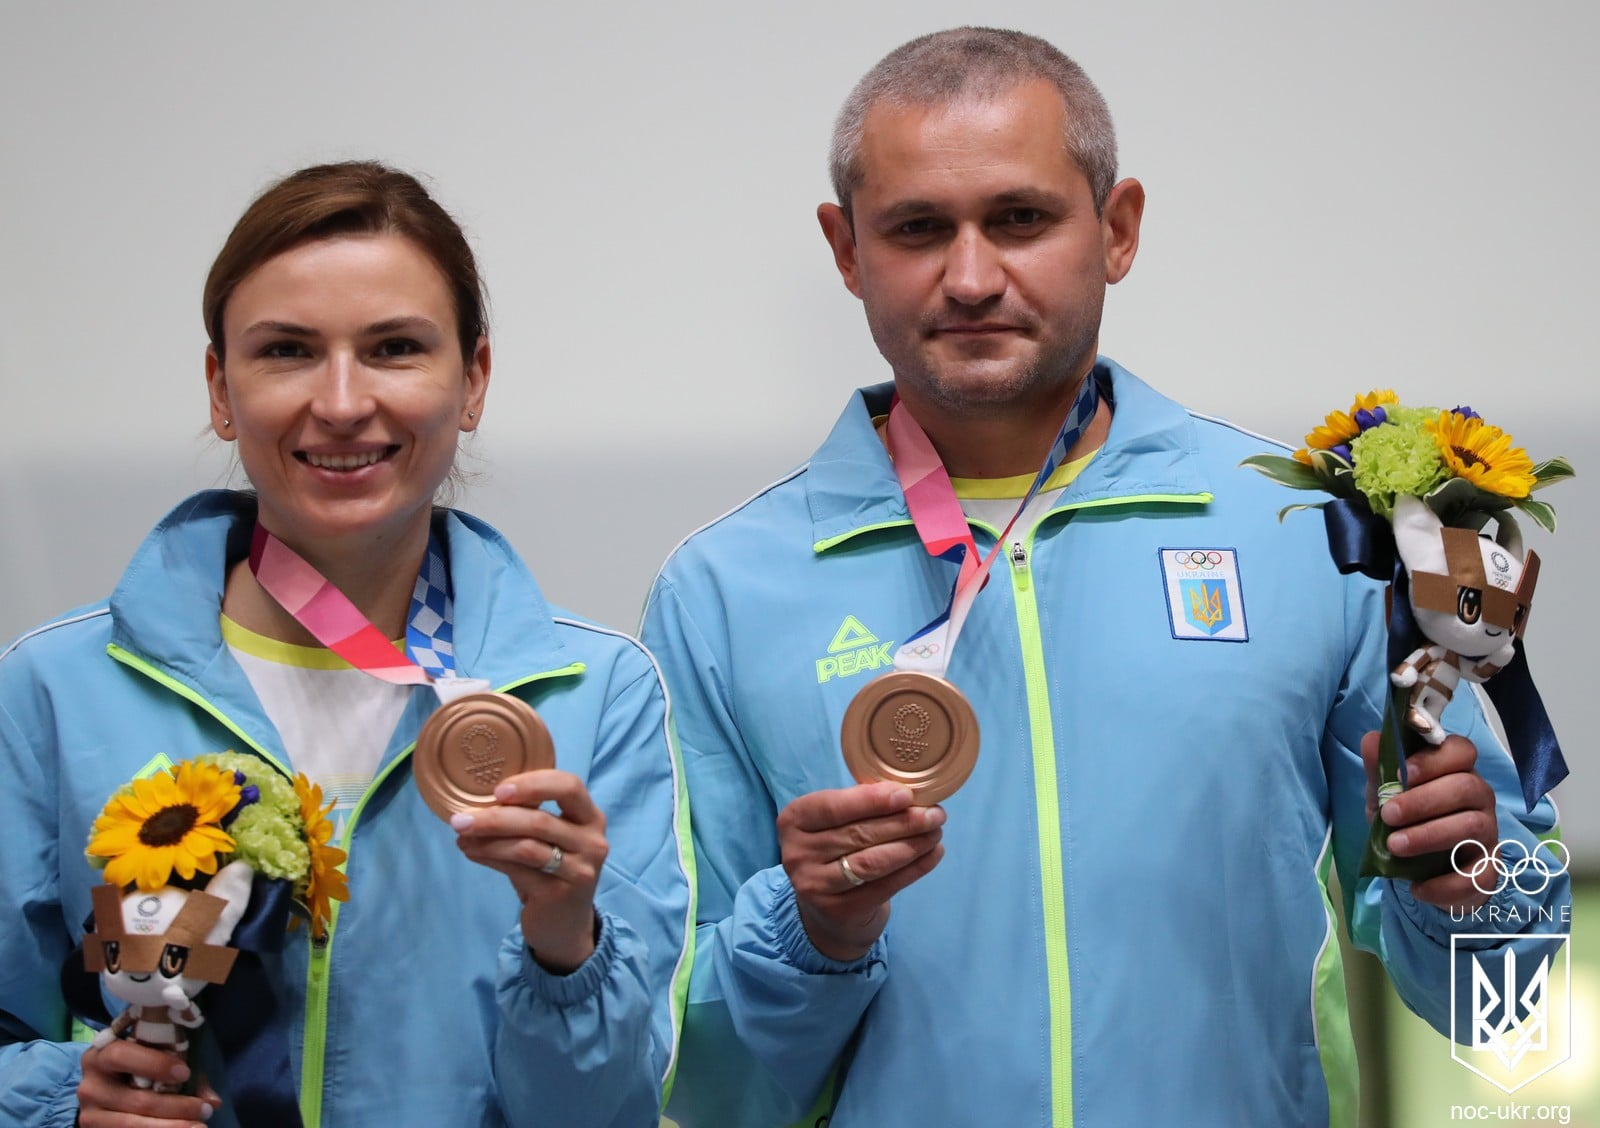 Олимпиада-2021: стрелки Елена Костевич и Олег Омельчук завоевали «бронзу»